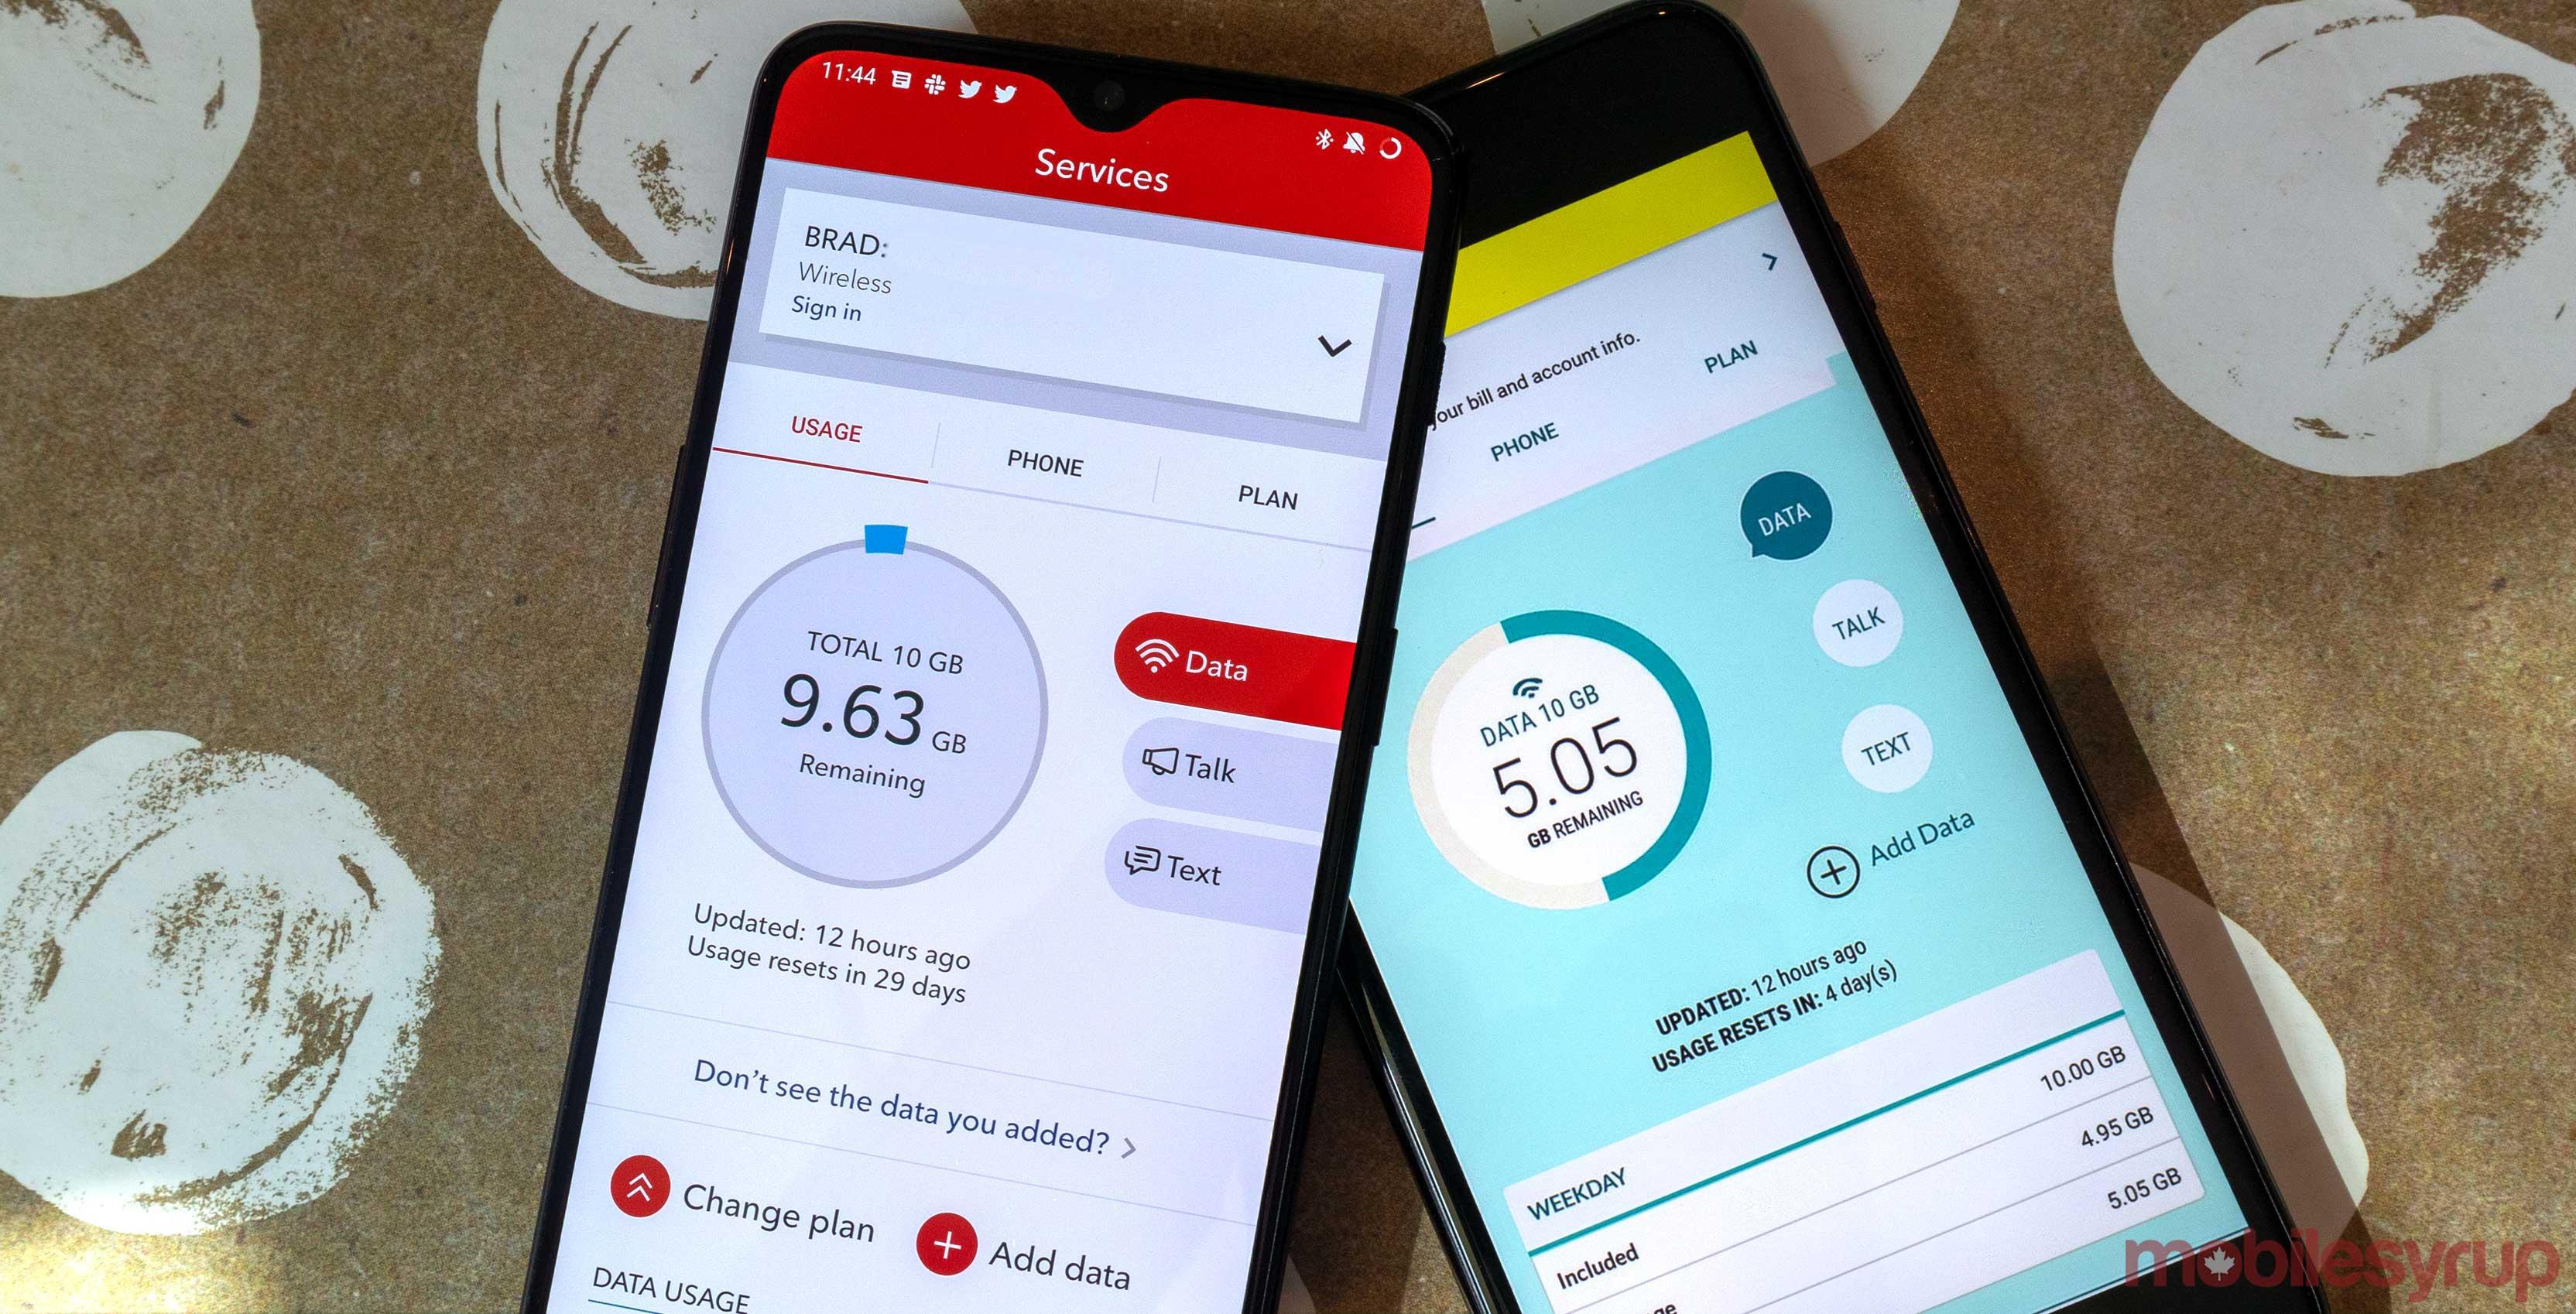 Fido Offers 2gb Of Bonus Data Alongside 2gb And 5gb Data Plans